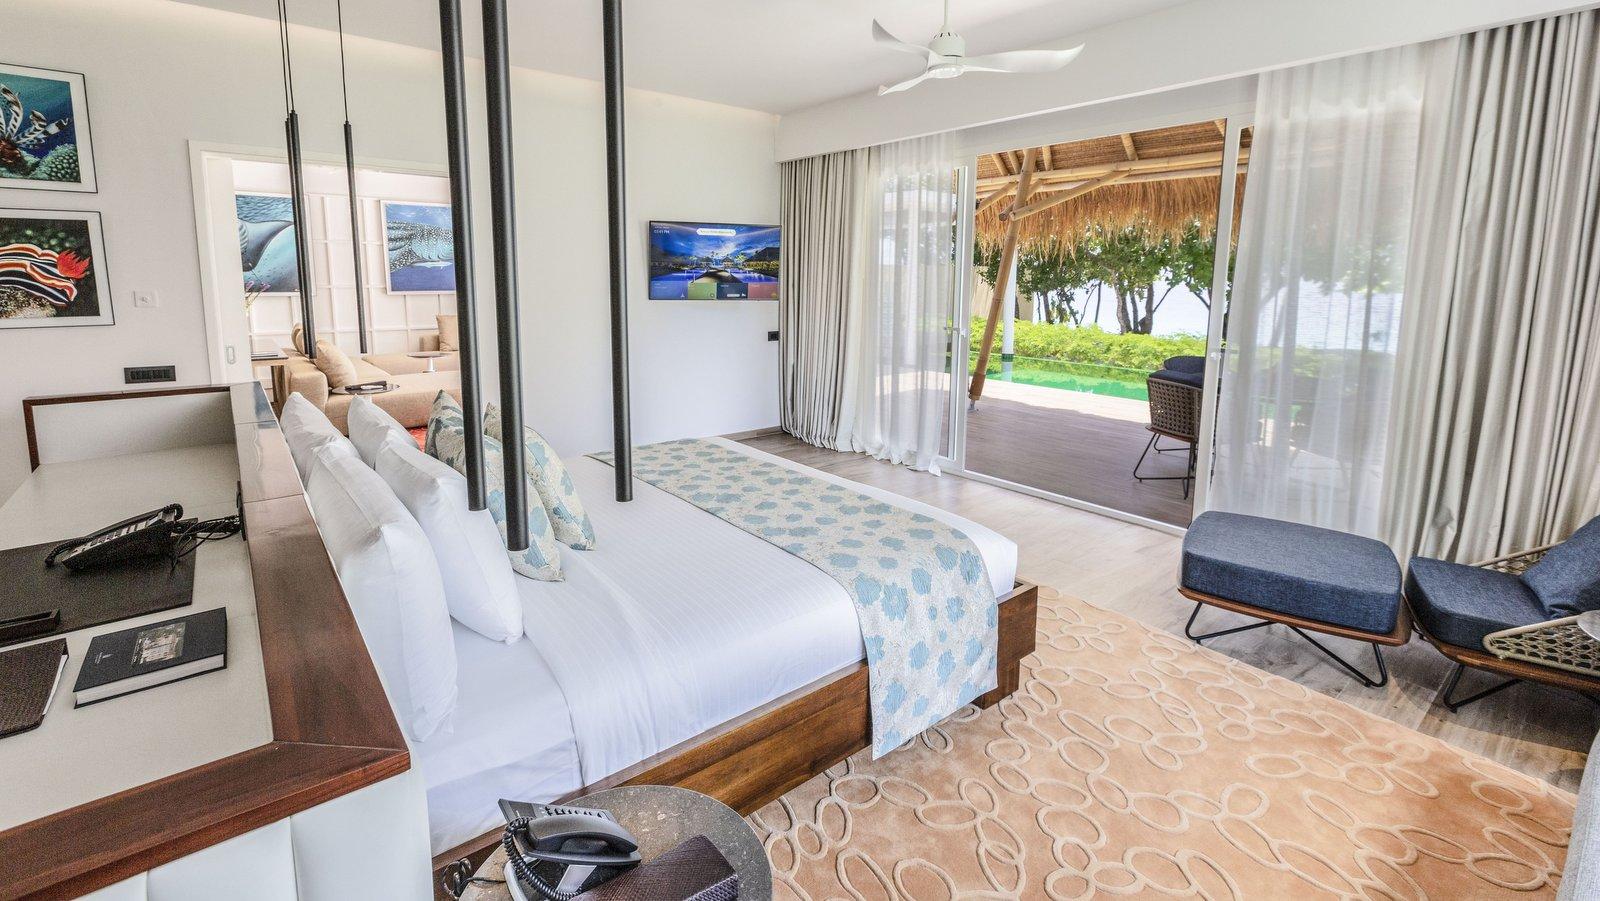 Мальдивы, отель Emerald Maldives Resort & Spa, номер Superior Beach Villa with Pool